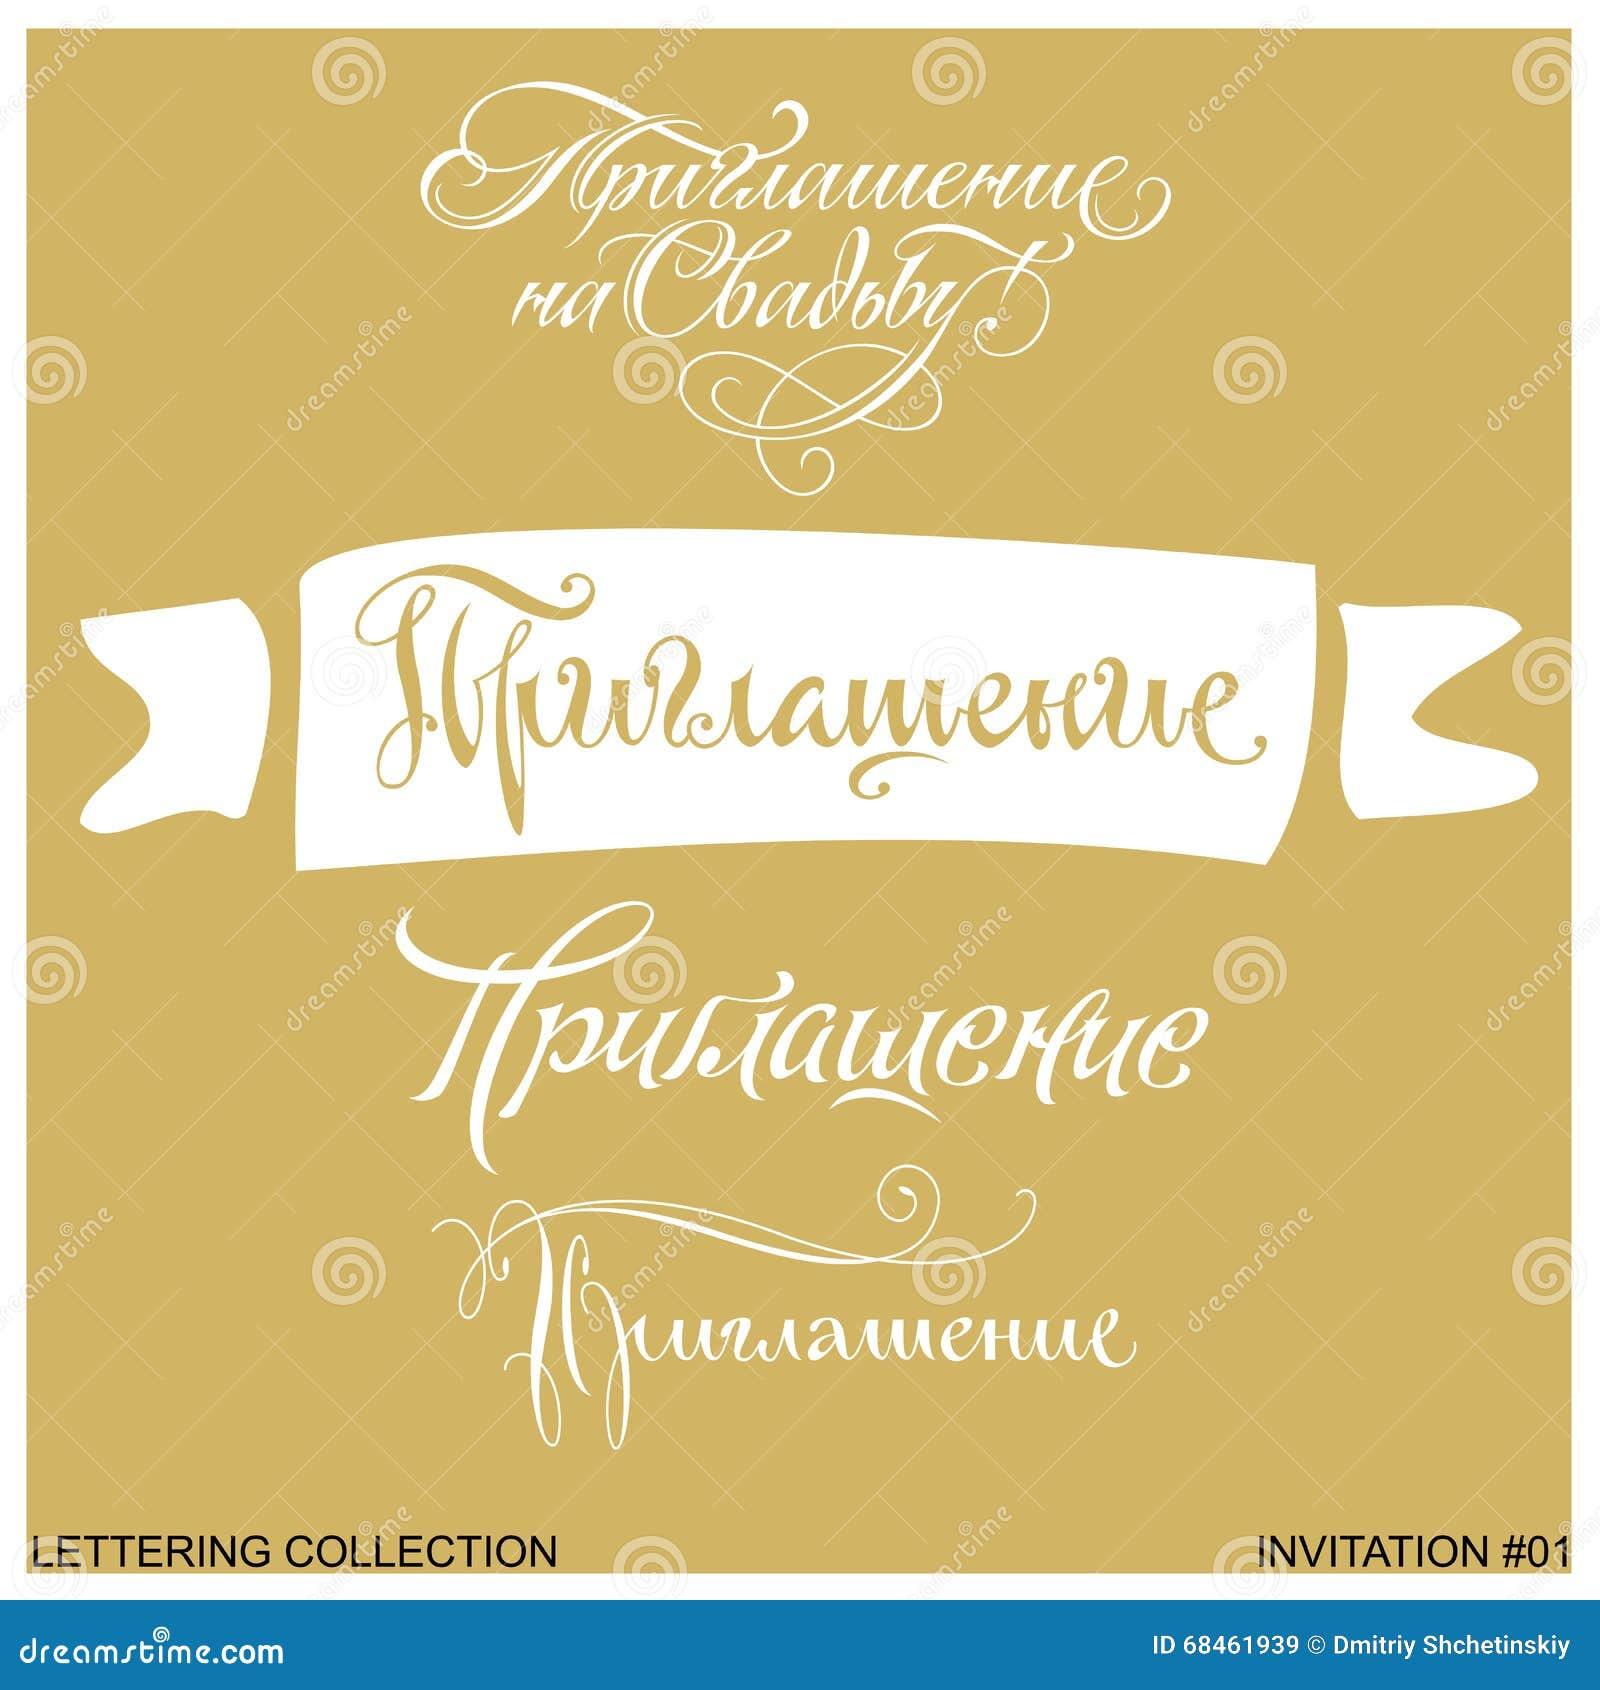 Invitation Greetings Hand Lettering Set Stock Vector Illustration